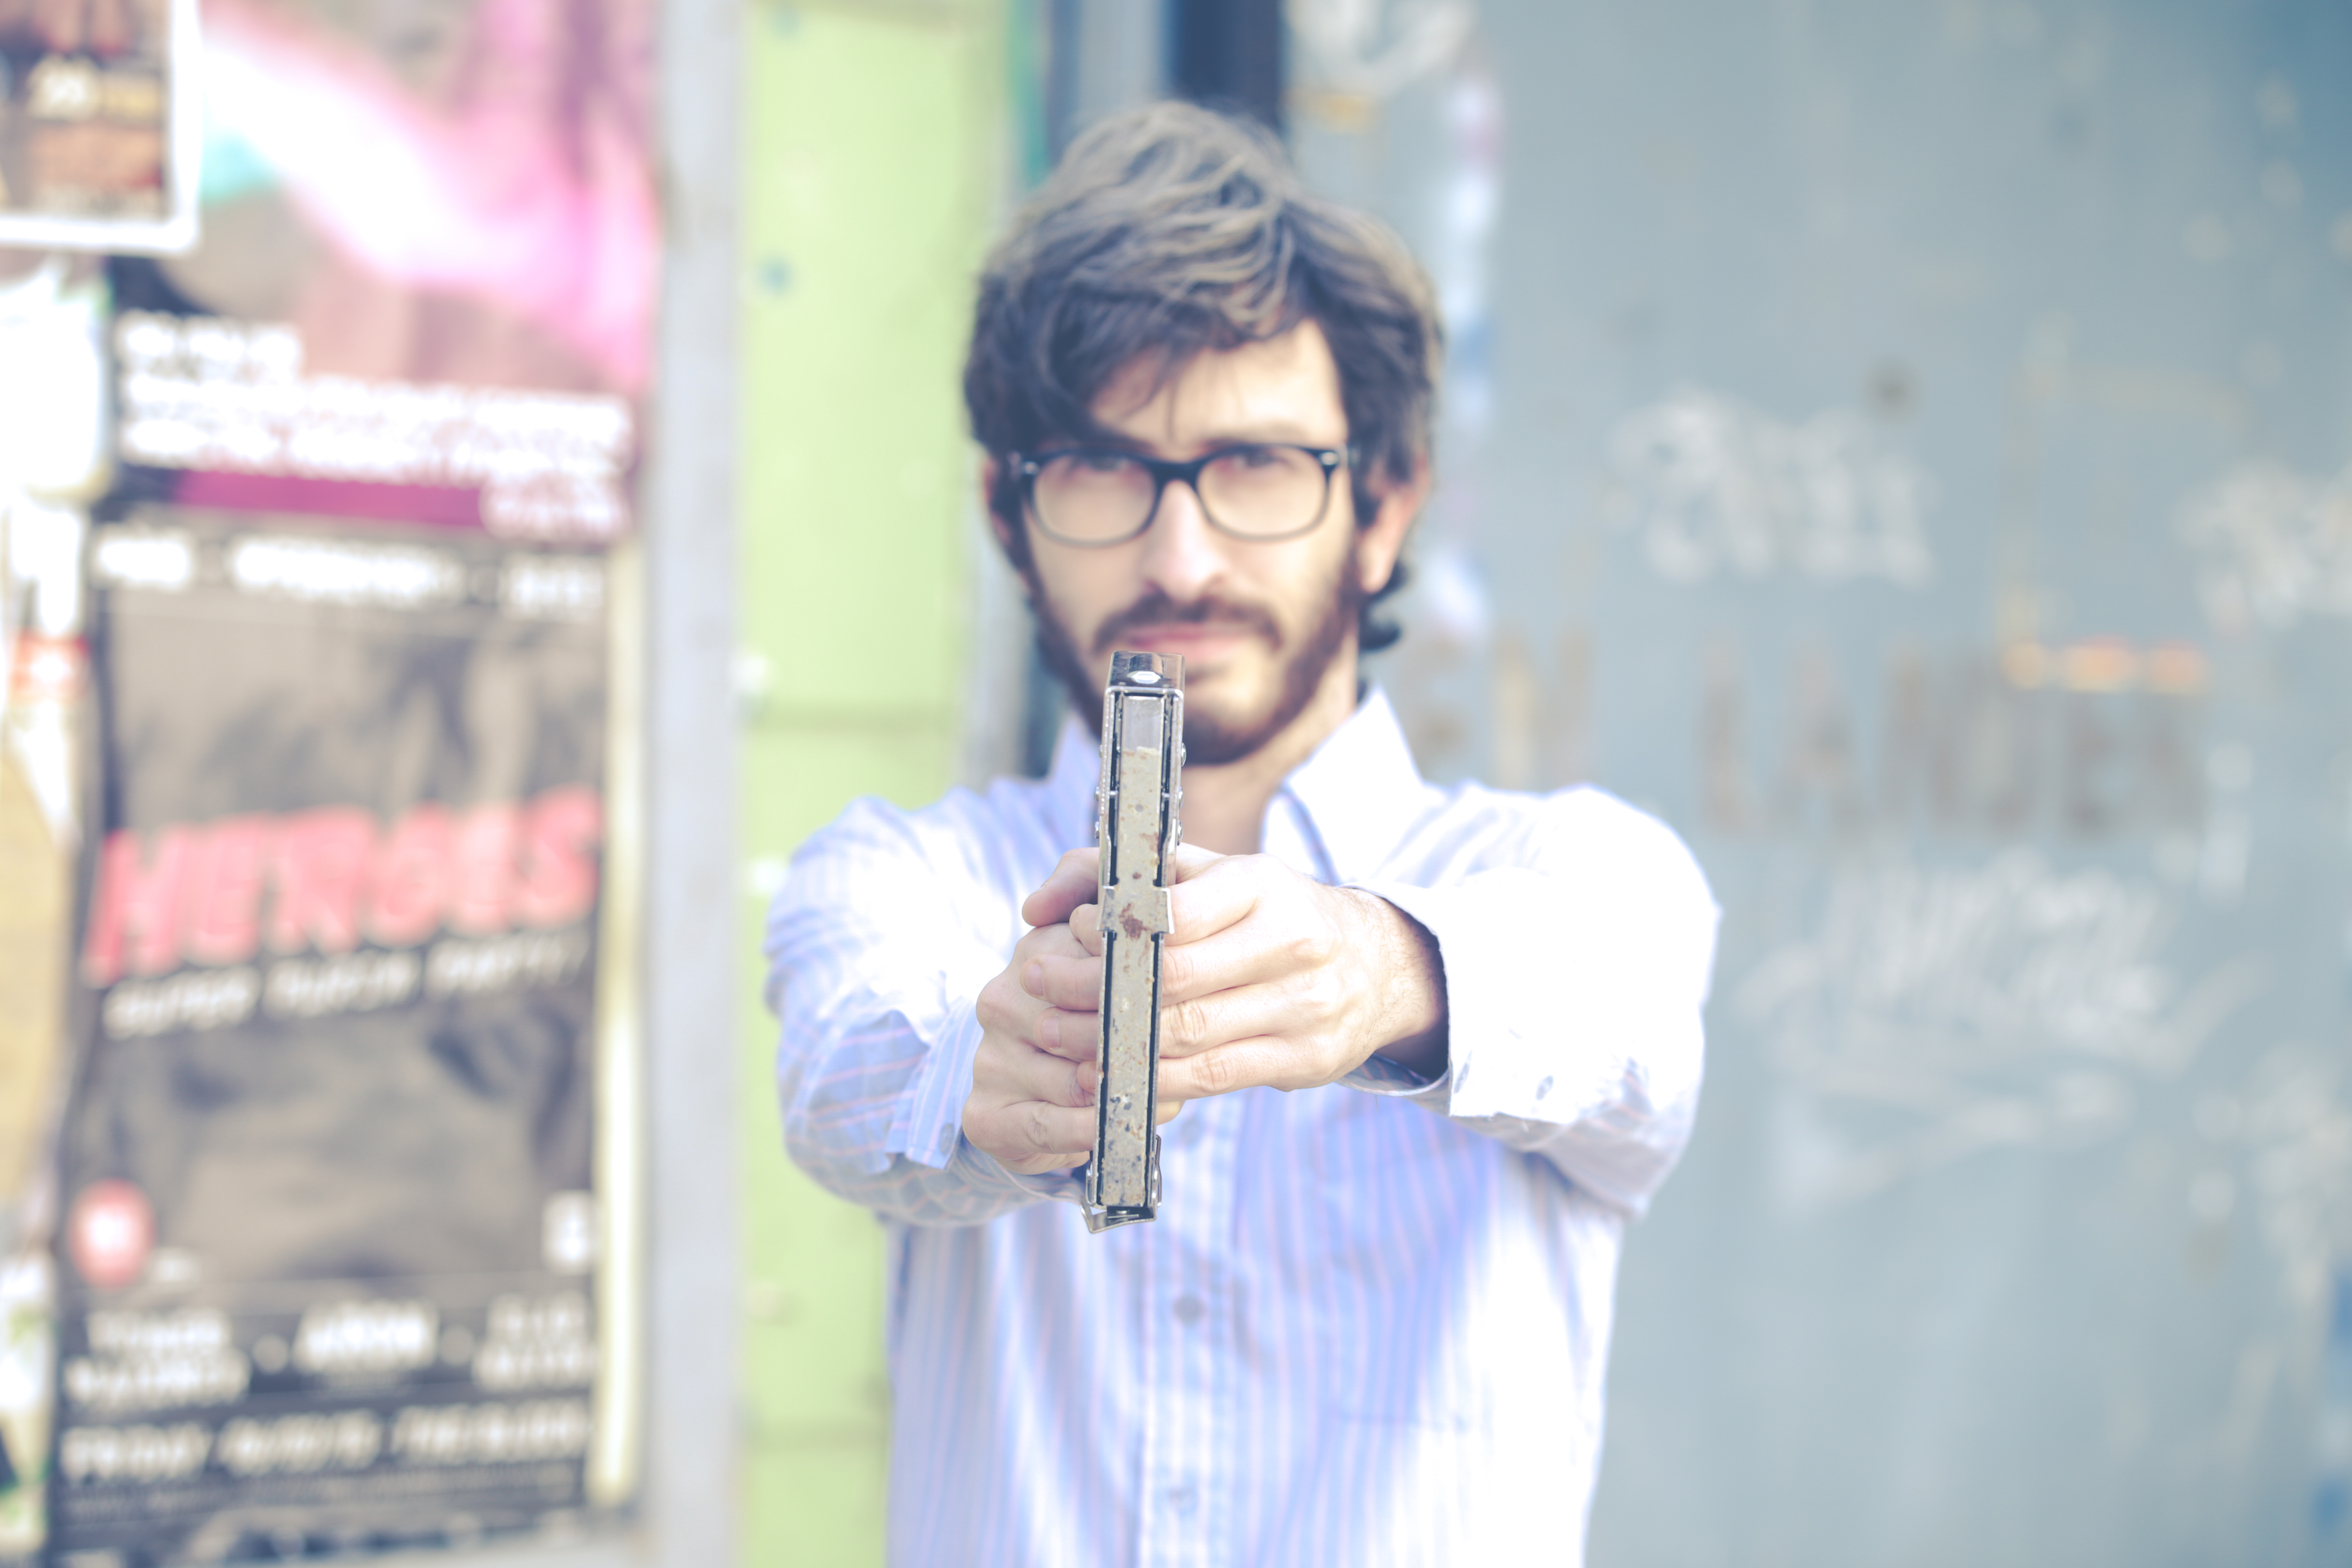 Pistola de grapas